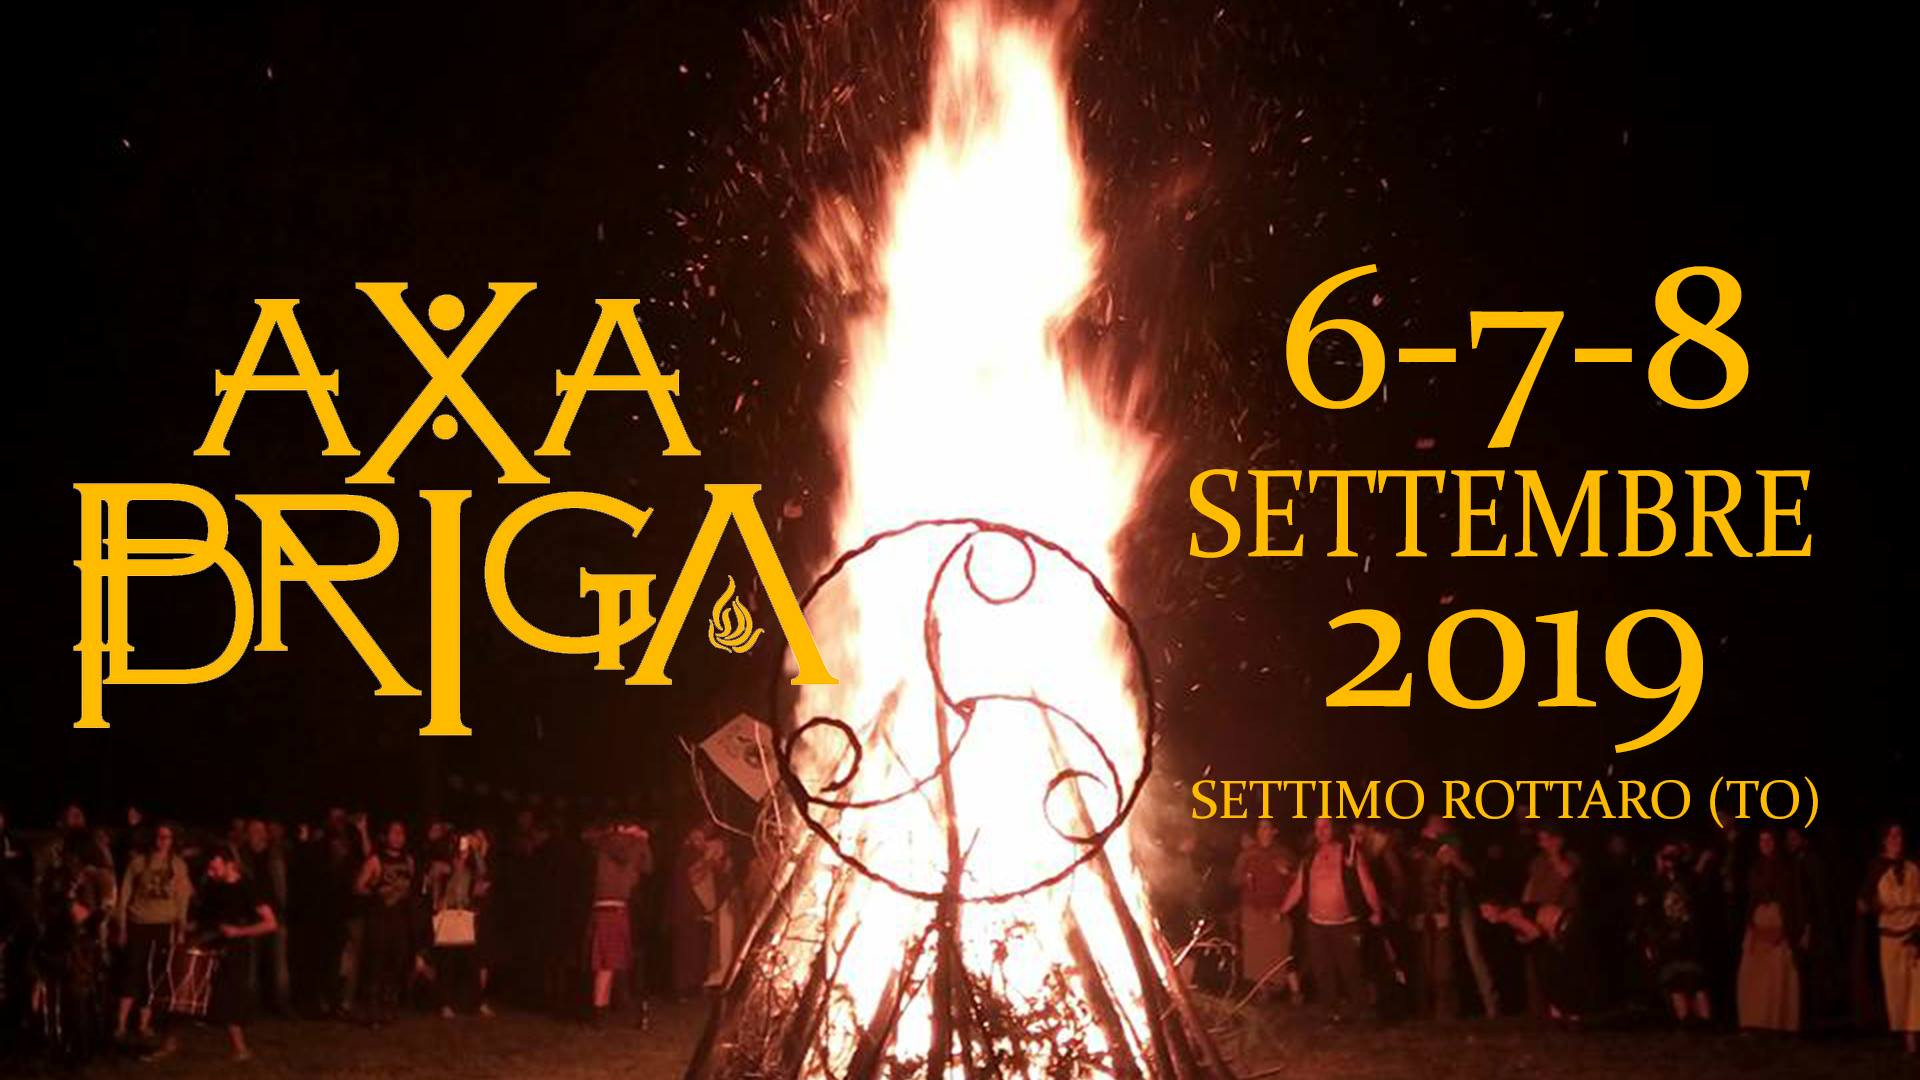 Axa Briga (TO) @ Settimo Rottaro | Piemonte | Italia